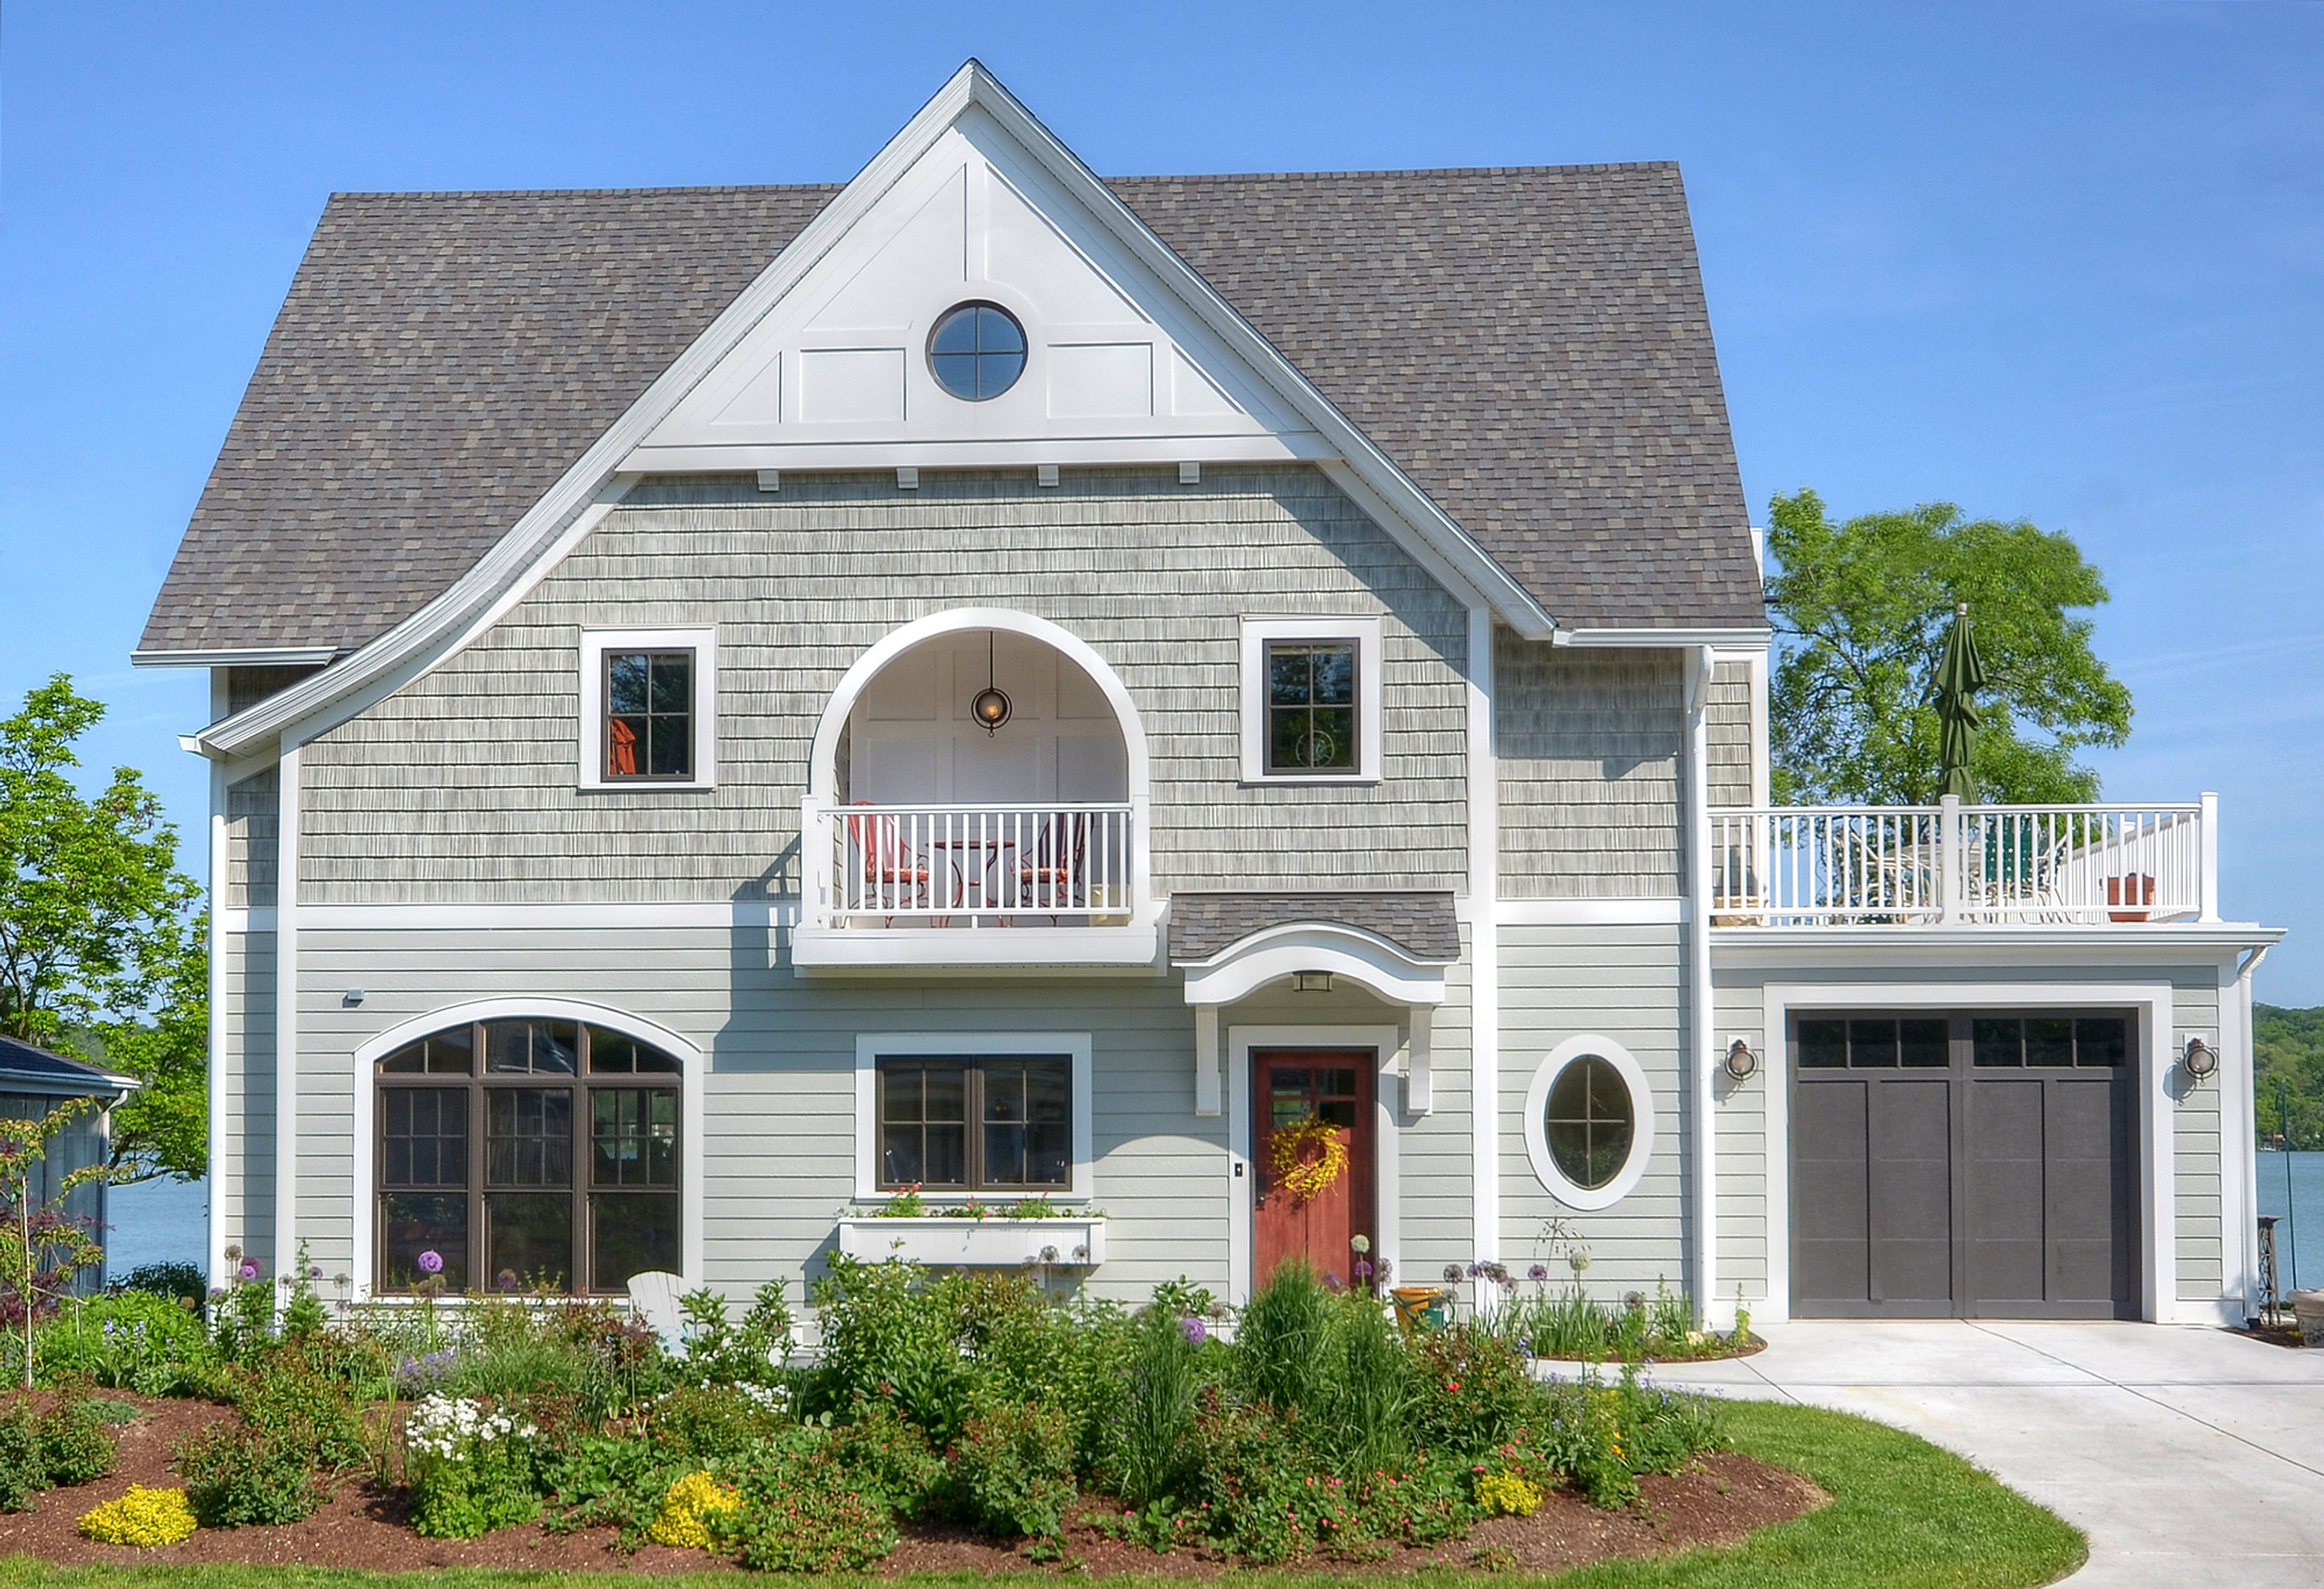 Jeremy Hartline Wisconsin residential rchitect - ^